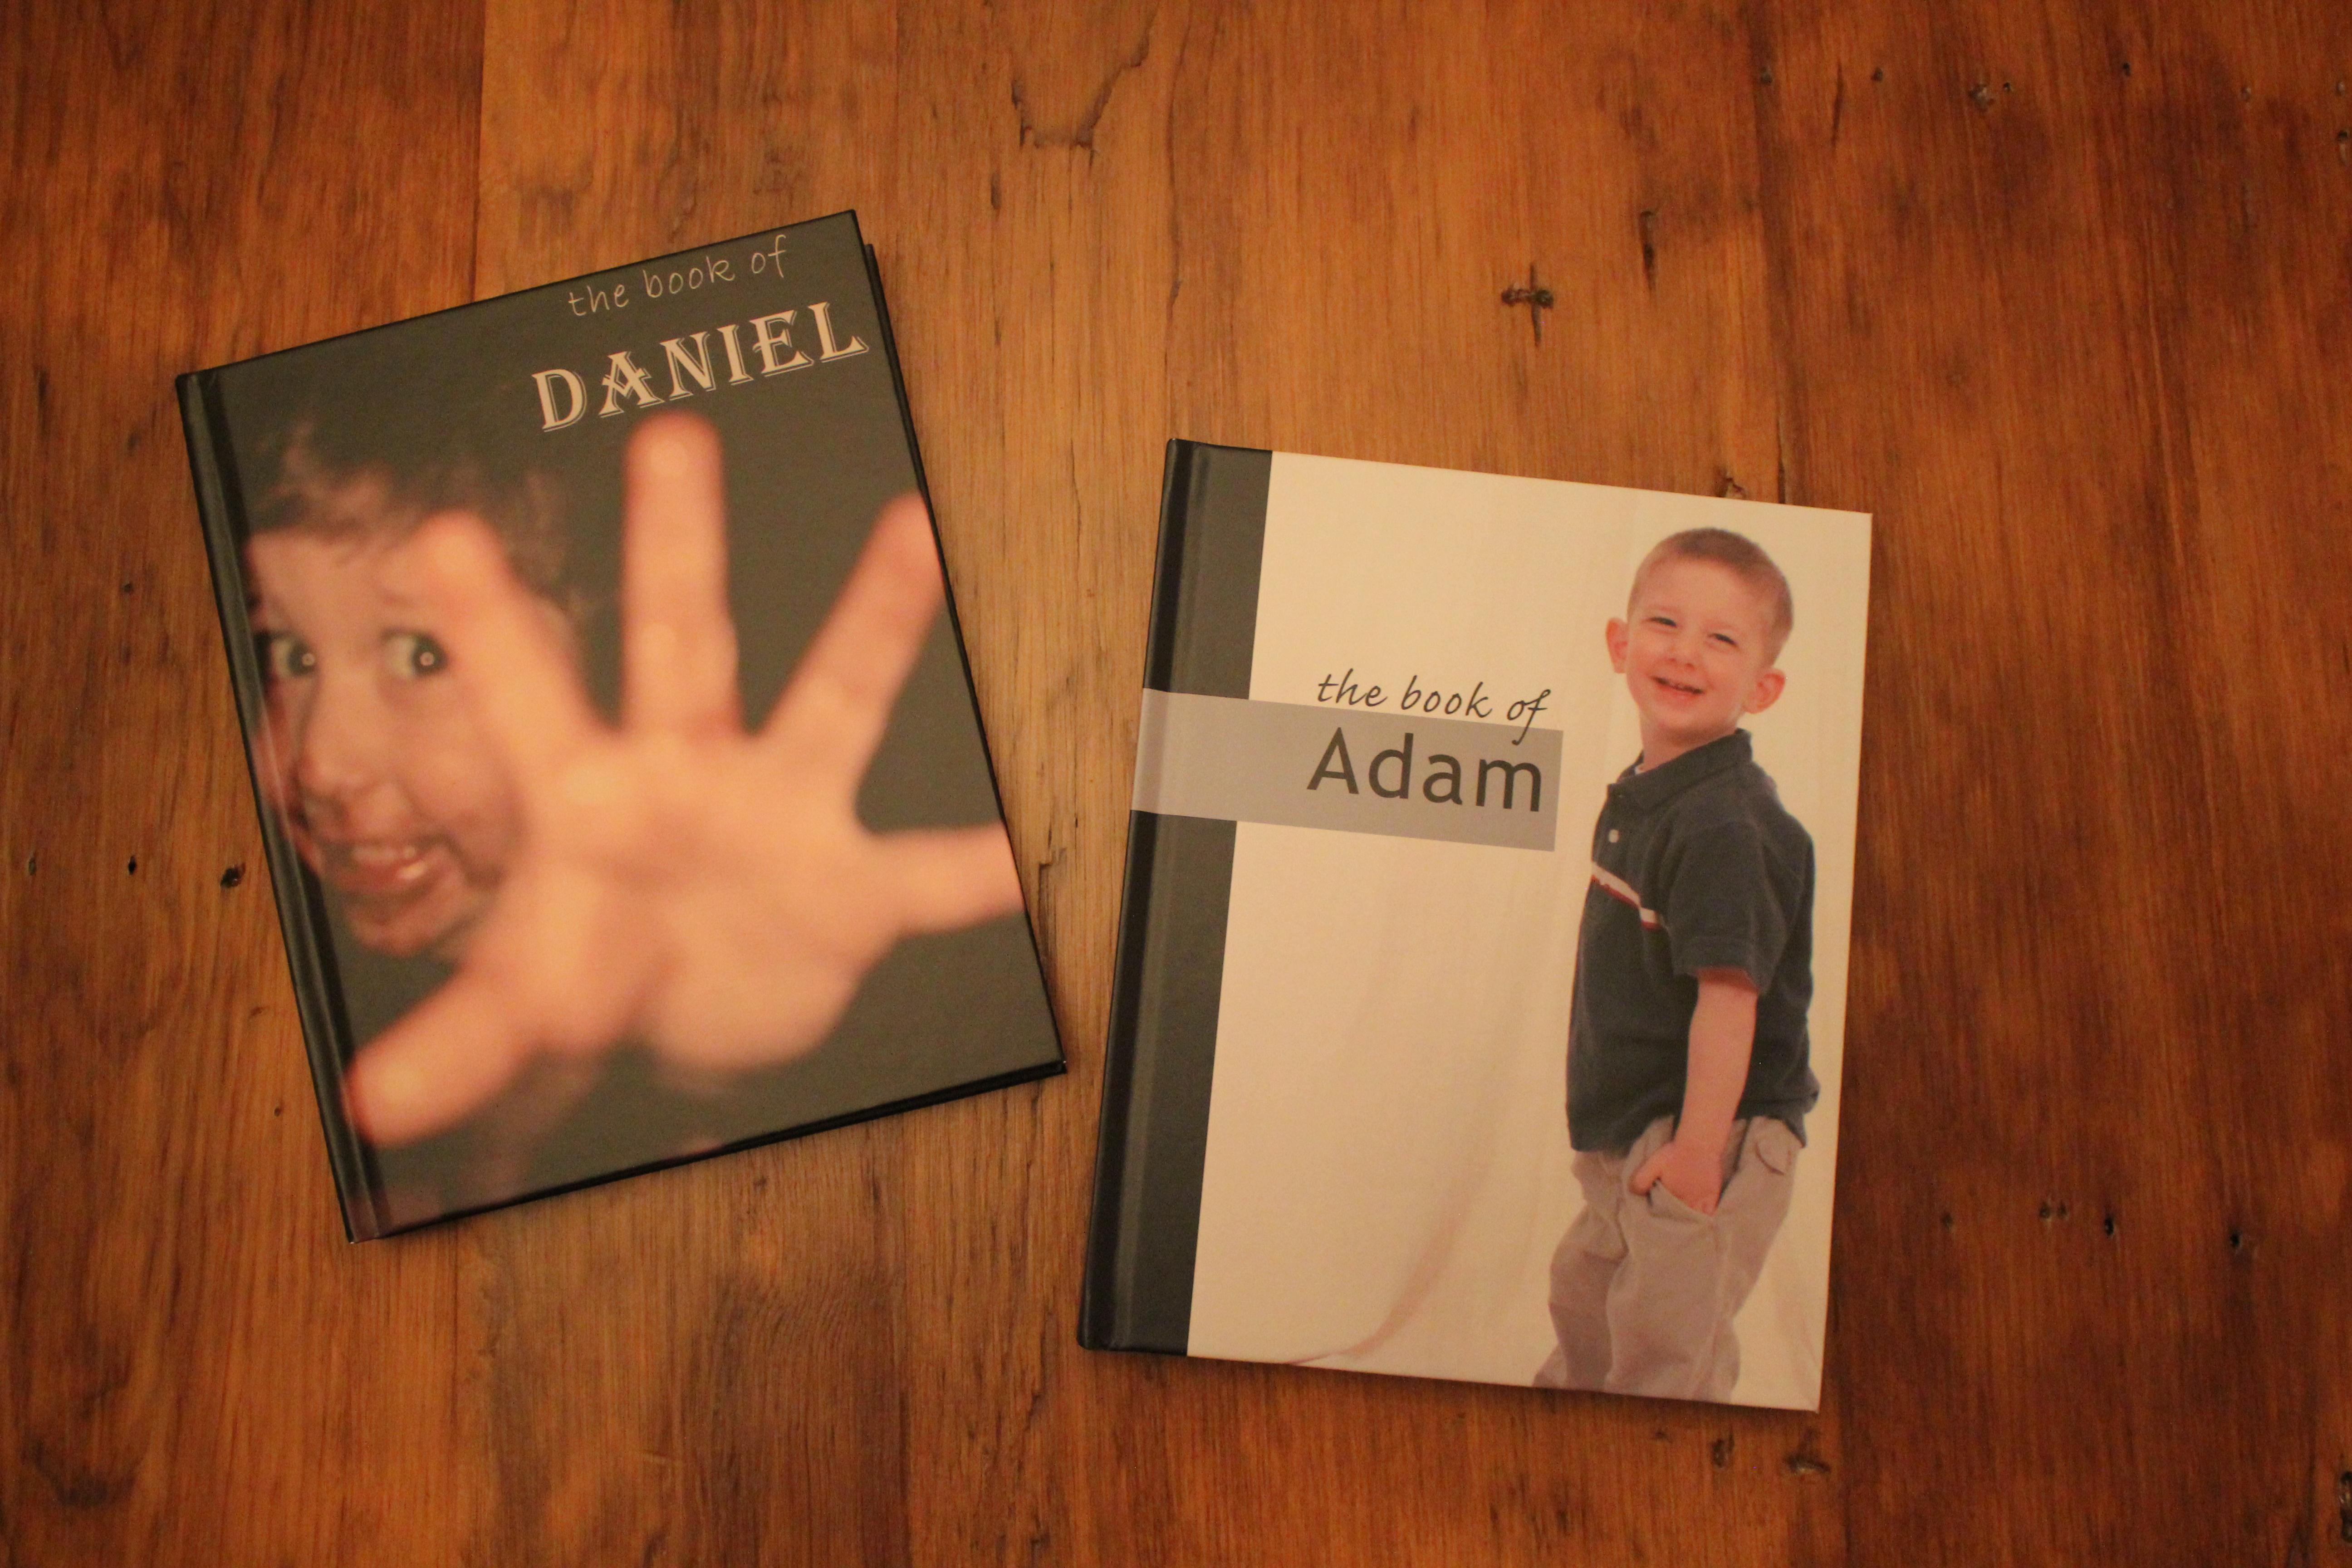 Daniel and Adam